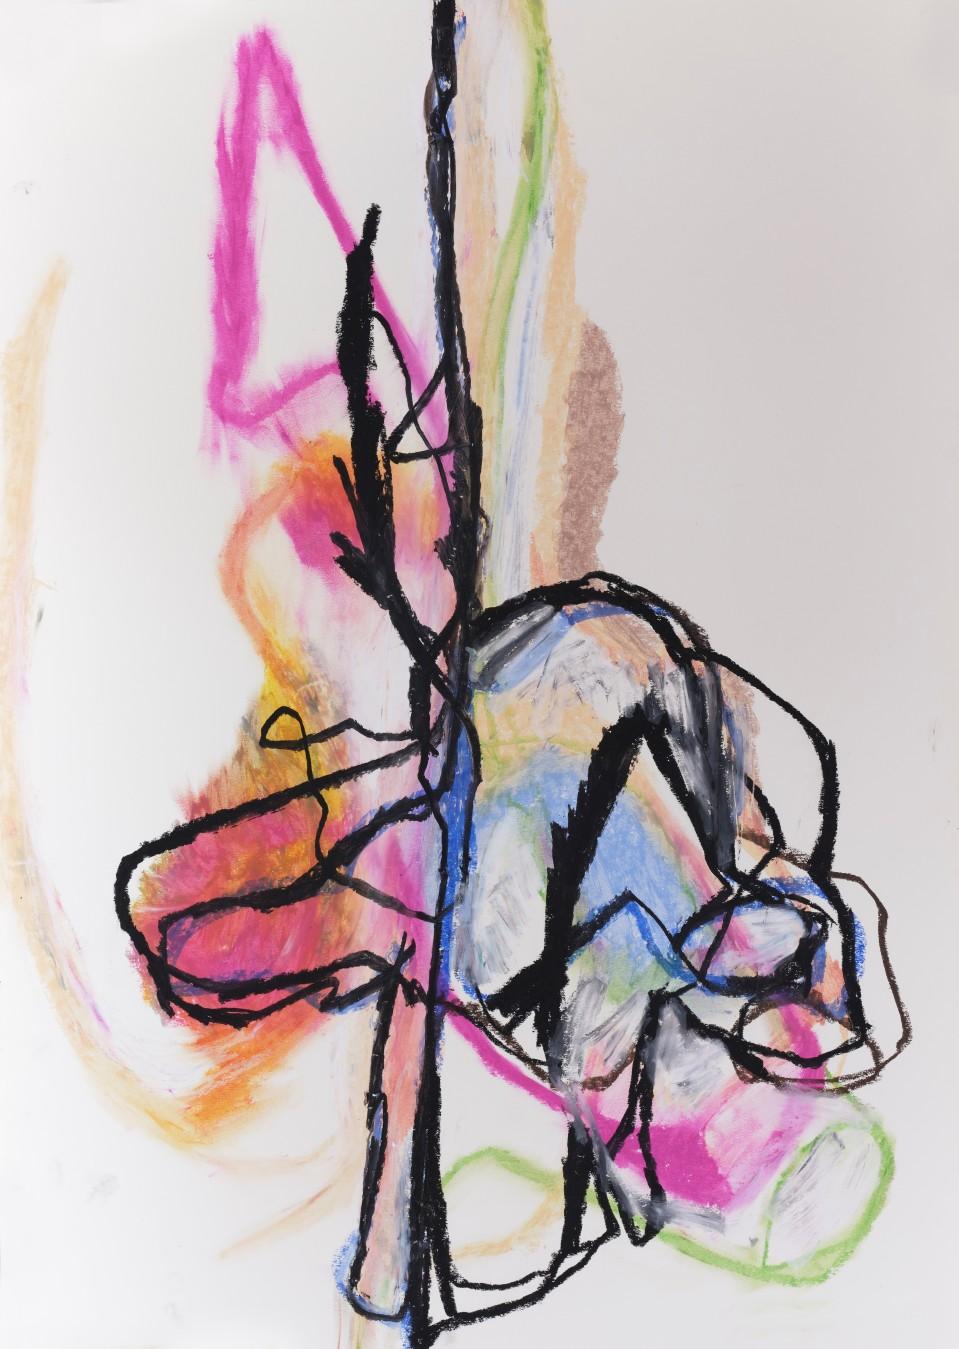 Hermaphroditus 2, 2019, 65 cm x 50 cm, oil pastel on paper